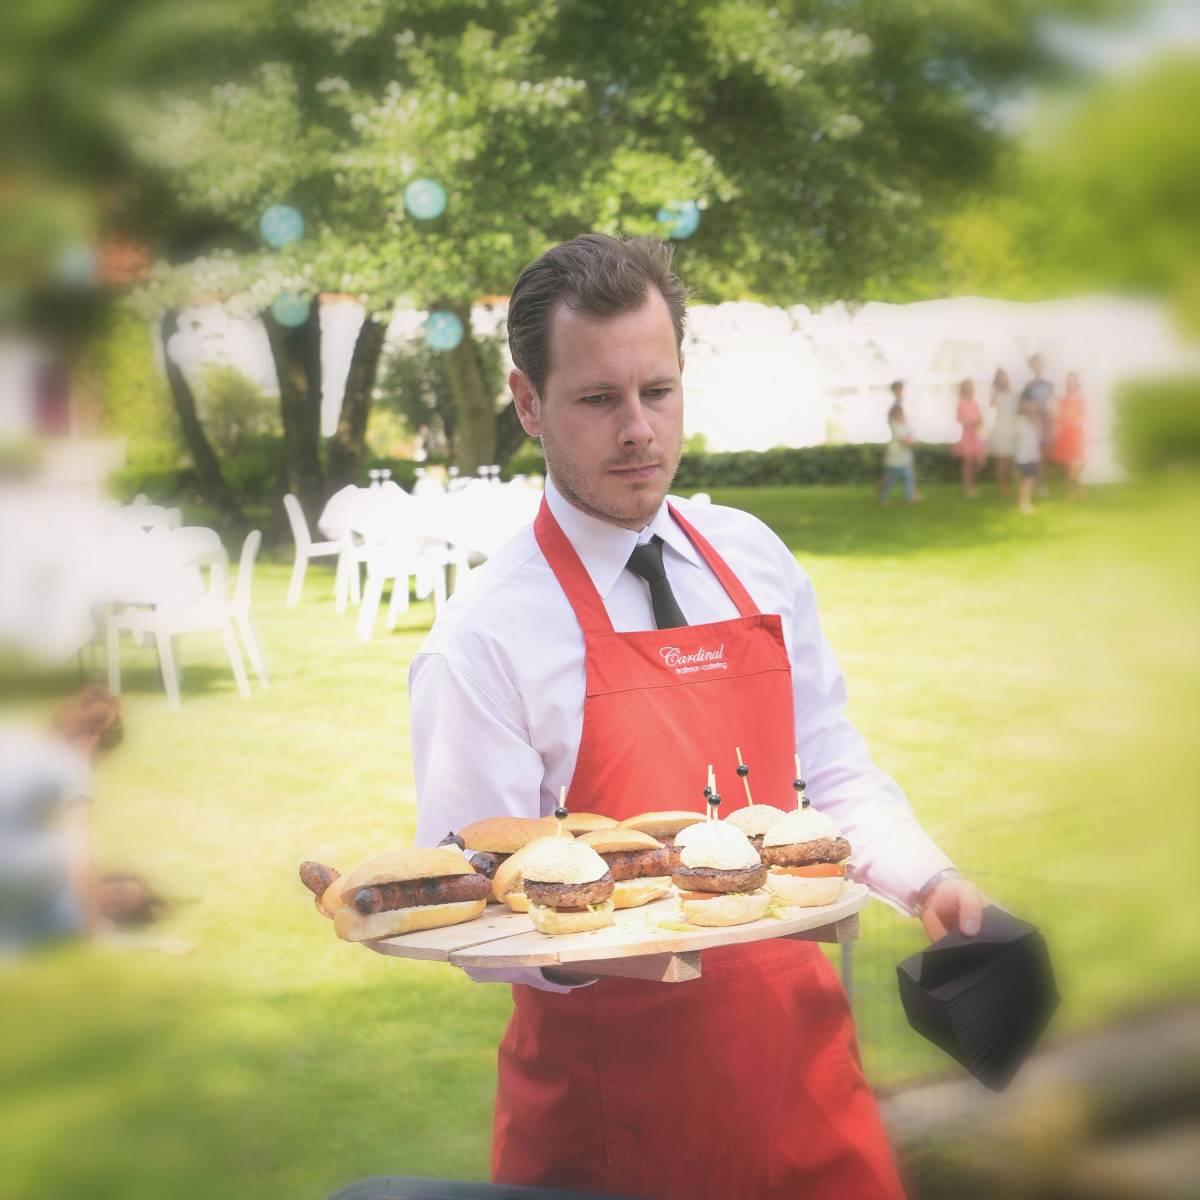 Cardinal Catering - Catering - Cateraar - House of Weddings - 1